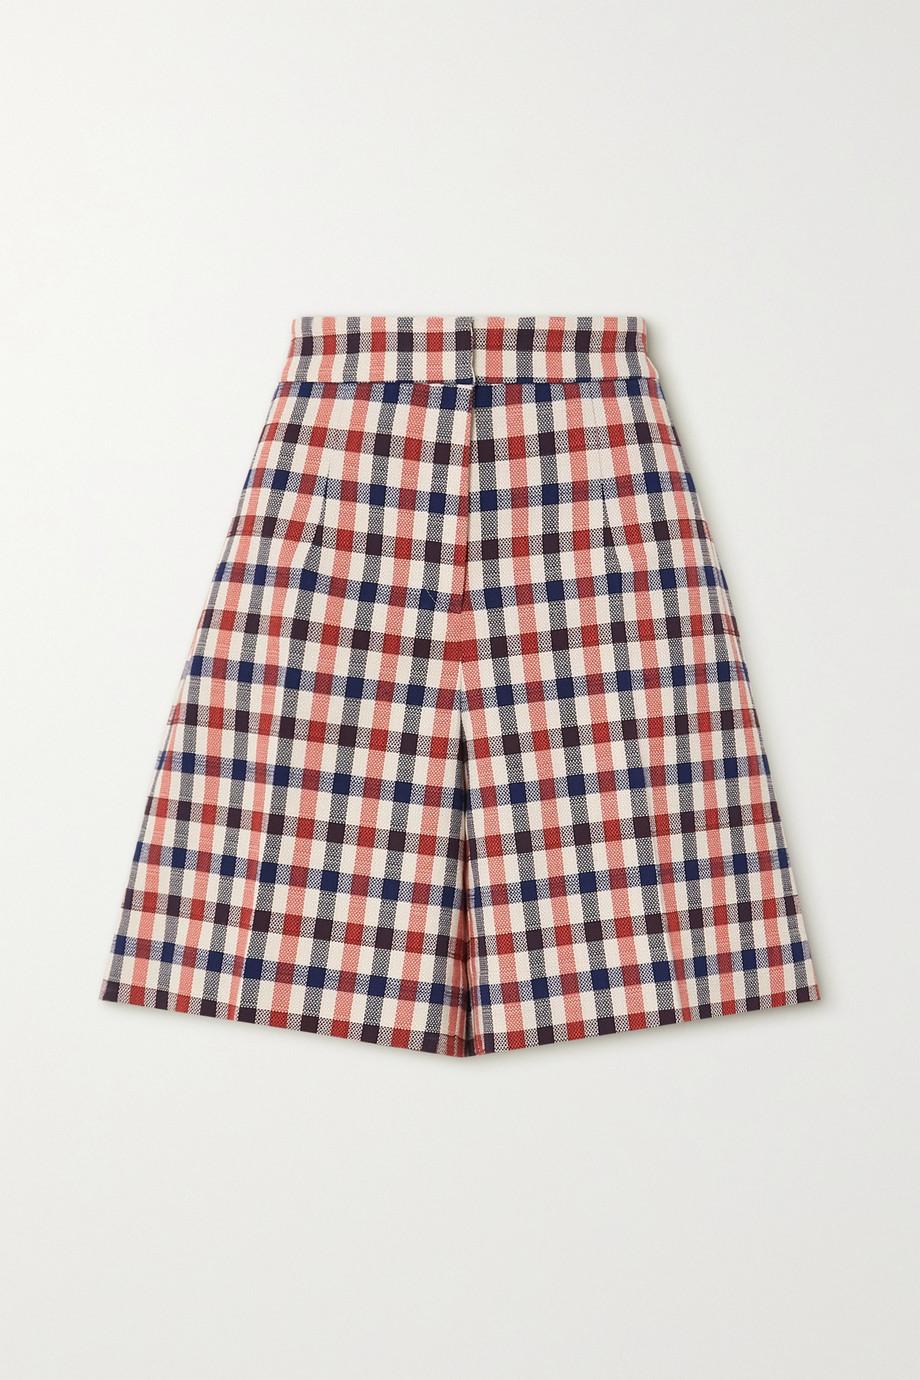 Victoria, Victoria Beckham Checked jacquard shorts